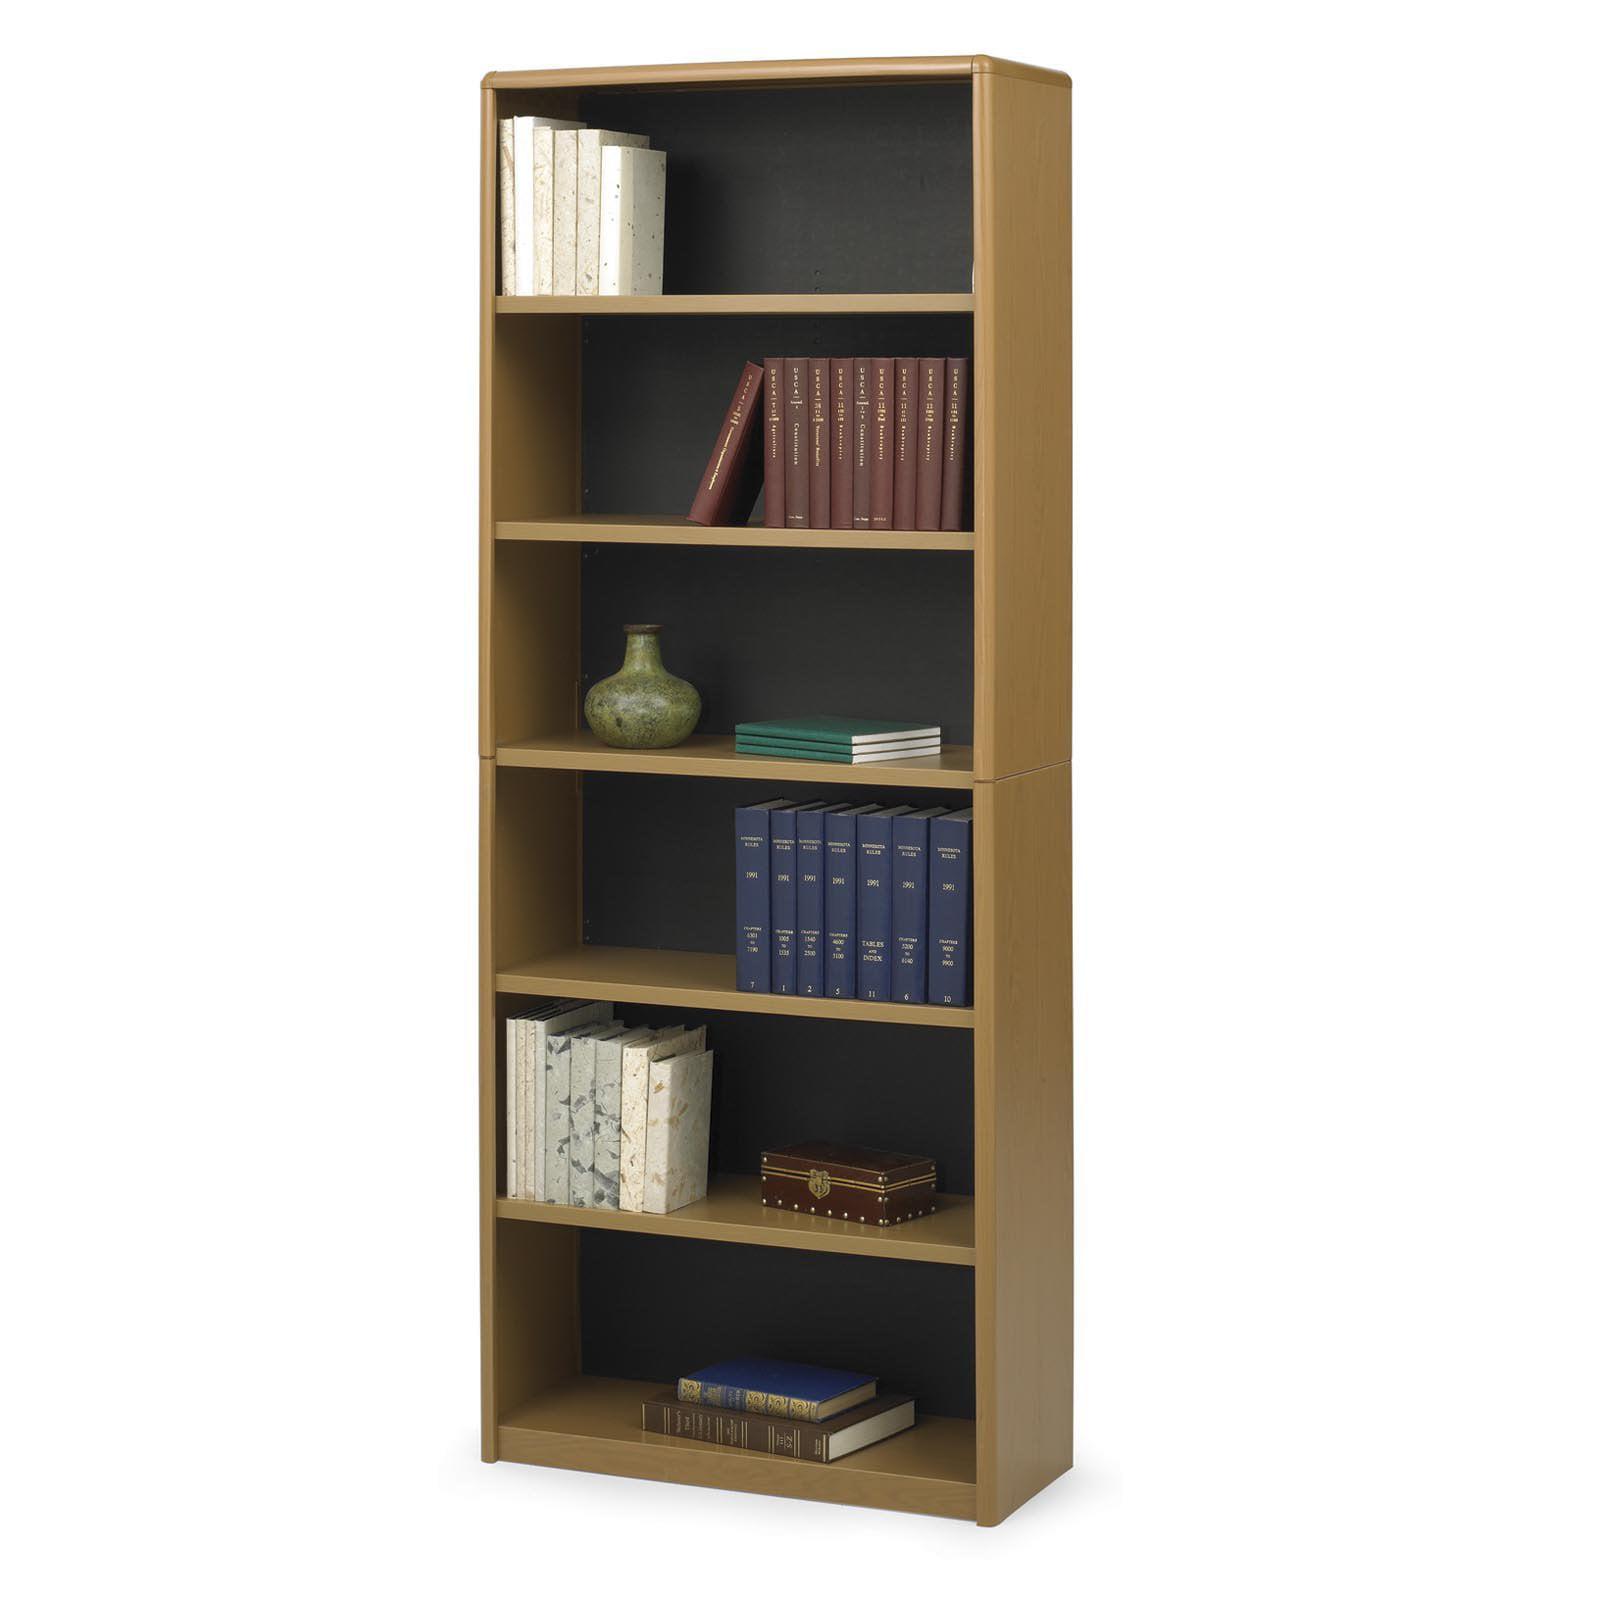 Safco 6-Shelf ValueMate Economy Bookcase 7174MO (Medium Oak)